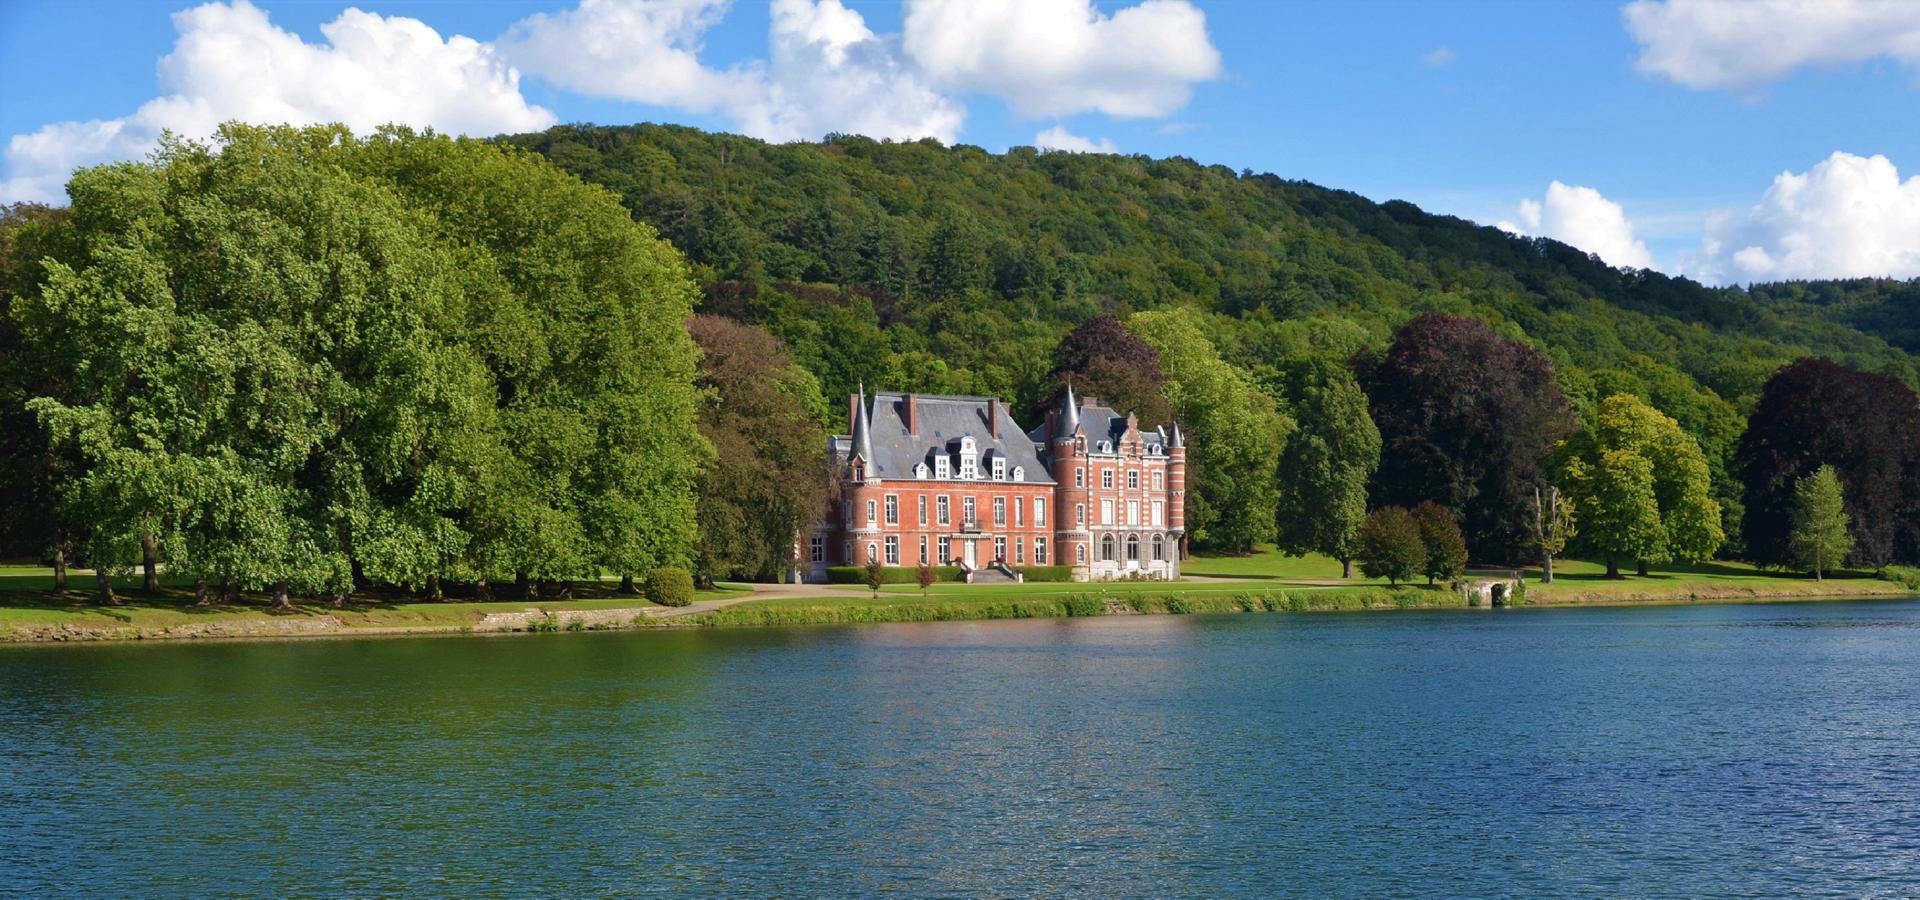 Peer-to-peer advisory in Wavre, Walloon Brabant Province, Wallonia, Belgium